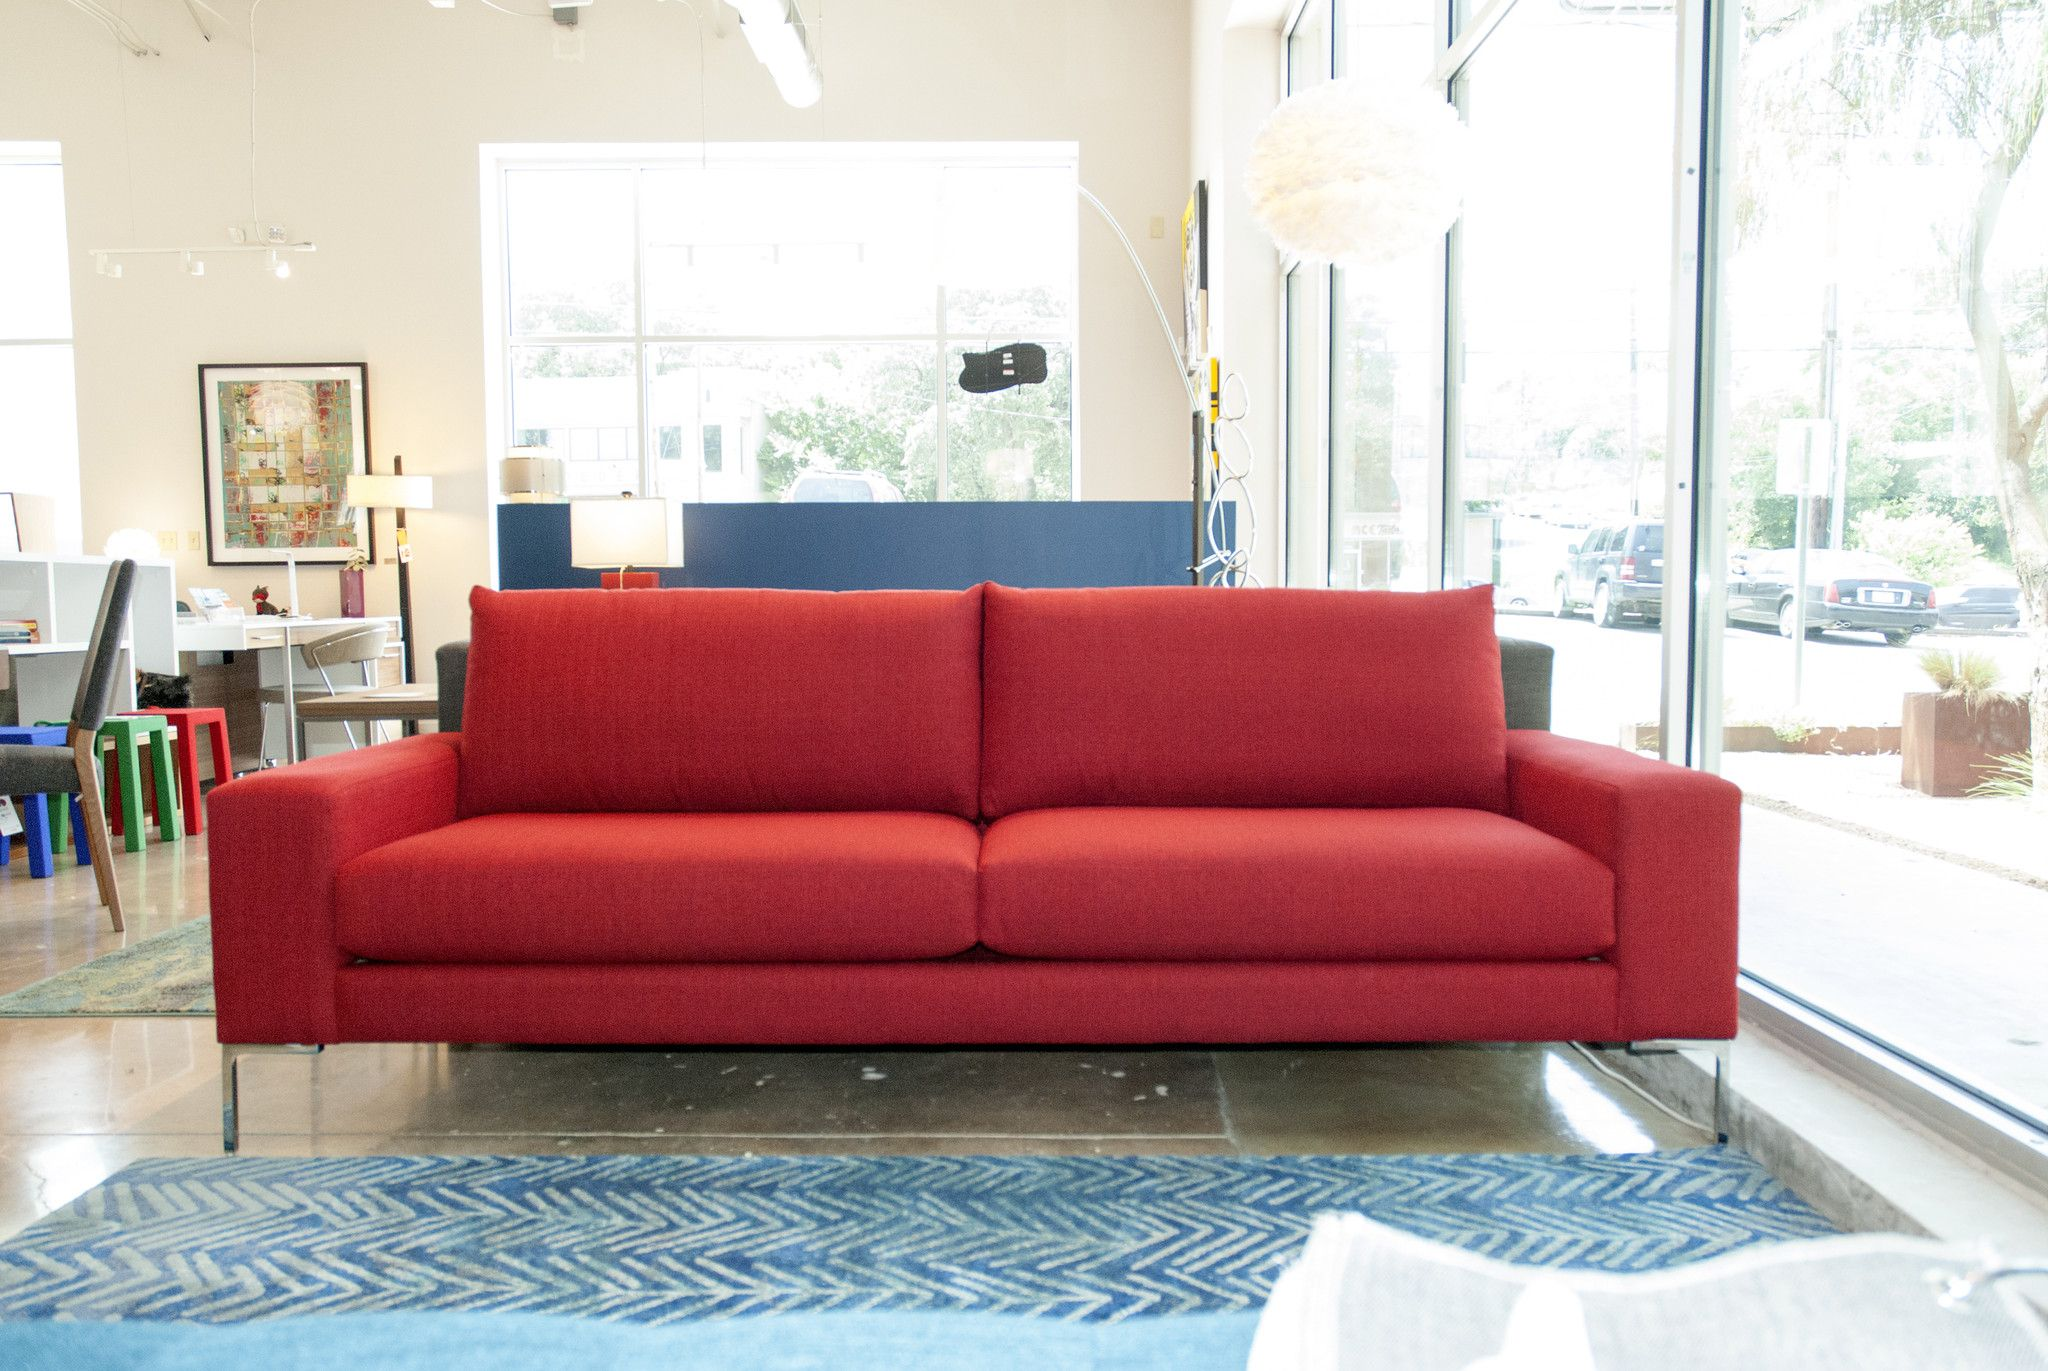 Merveilleux Lazar Sofa | Sofa Krtsy